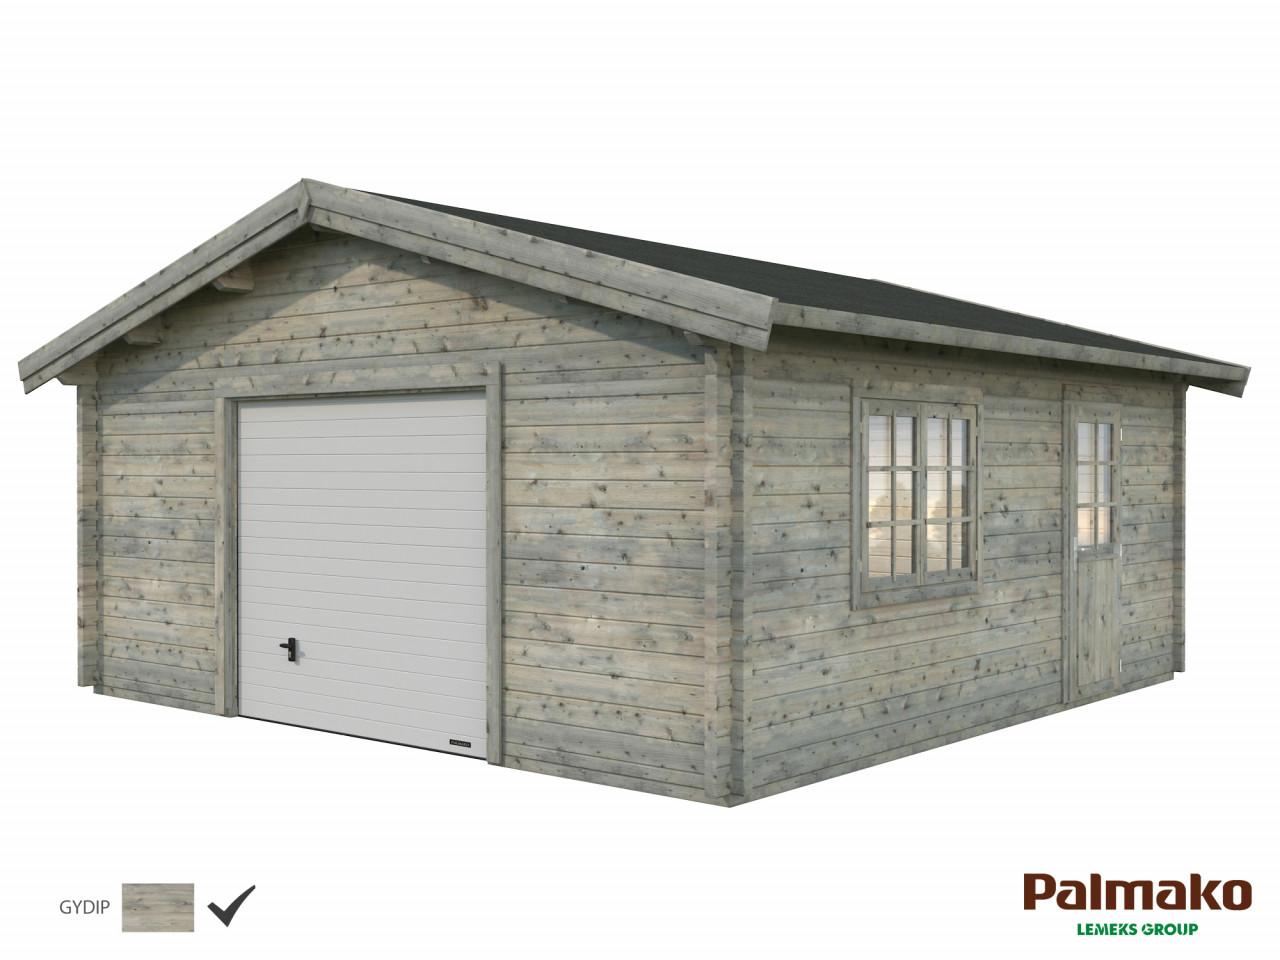 Palmako Holzgarage Roger 27,7 m² mit Sektionaltor